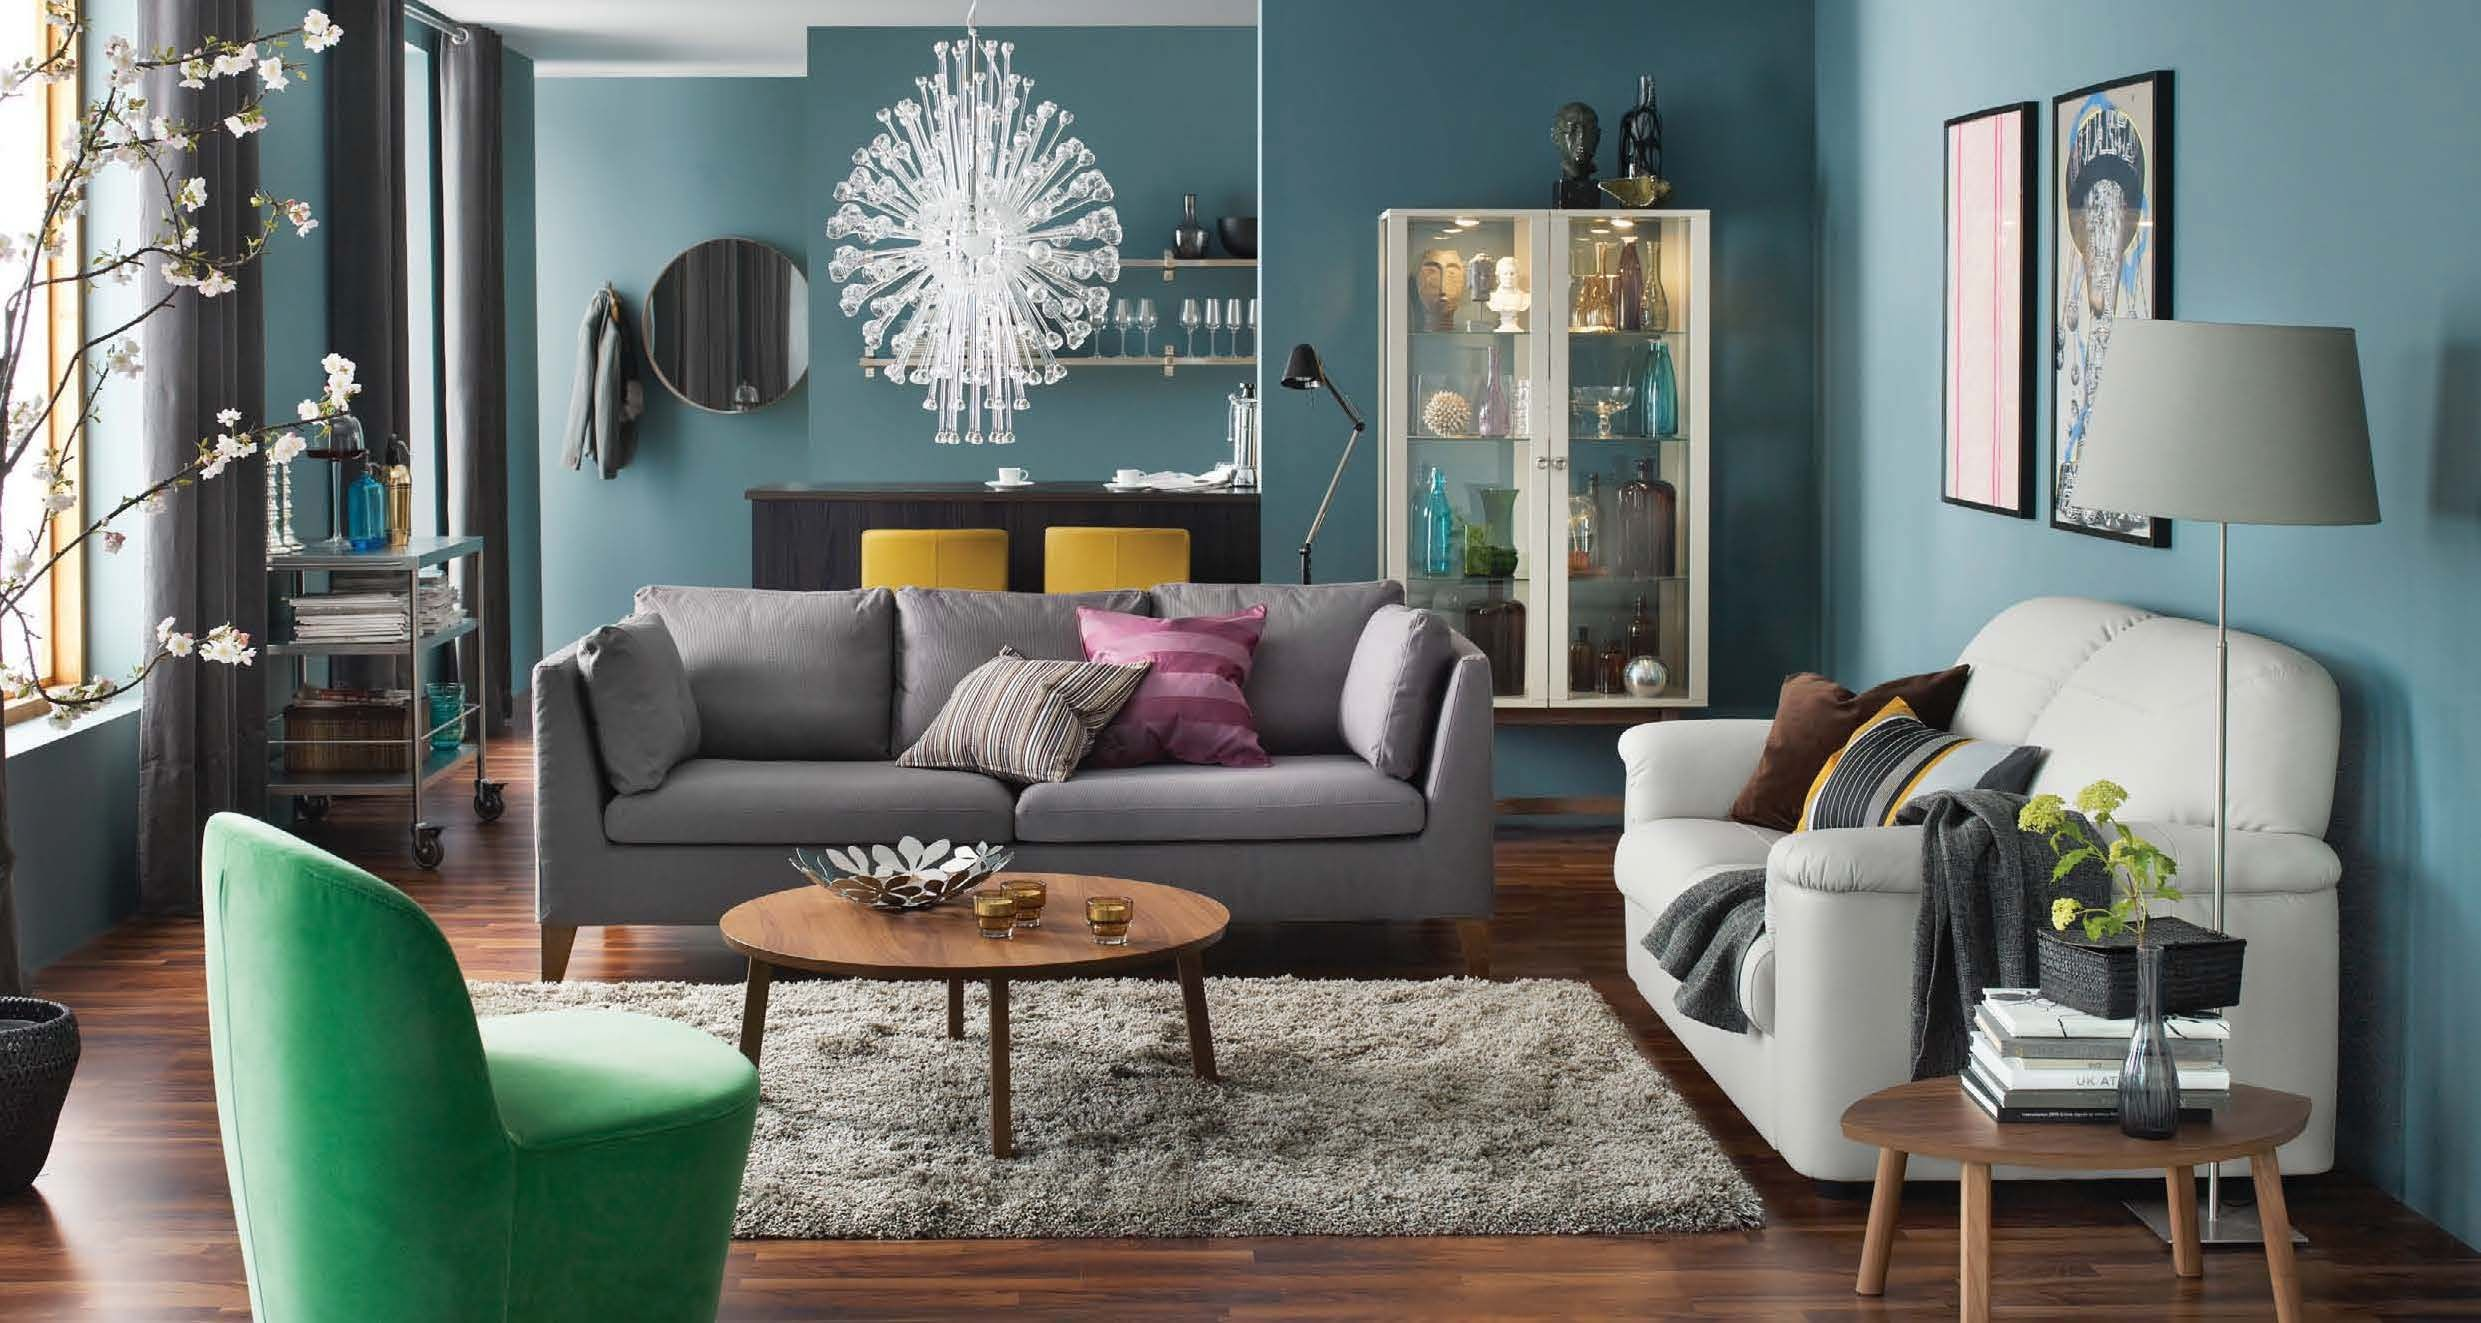 Ikea Design Ideas Living Room Artsyurbanlivingroom  Rmc  Pinterest  Clear Glass Pendant